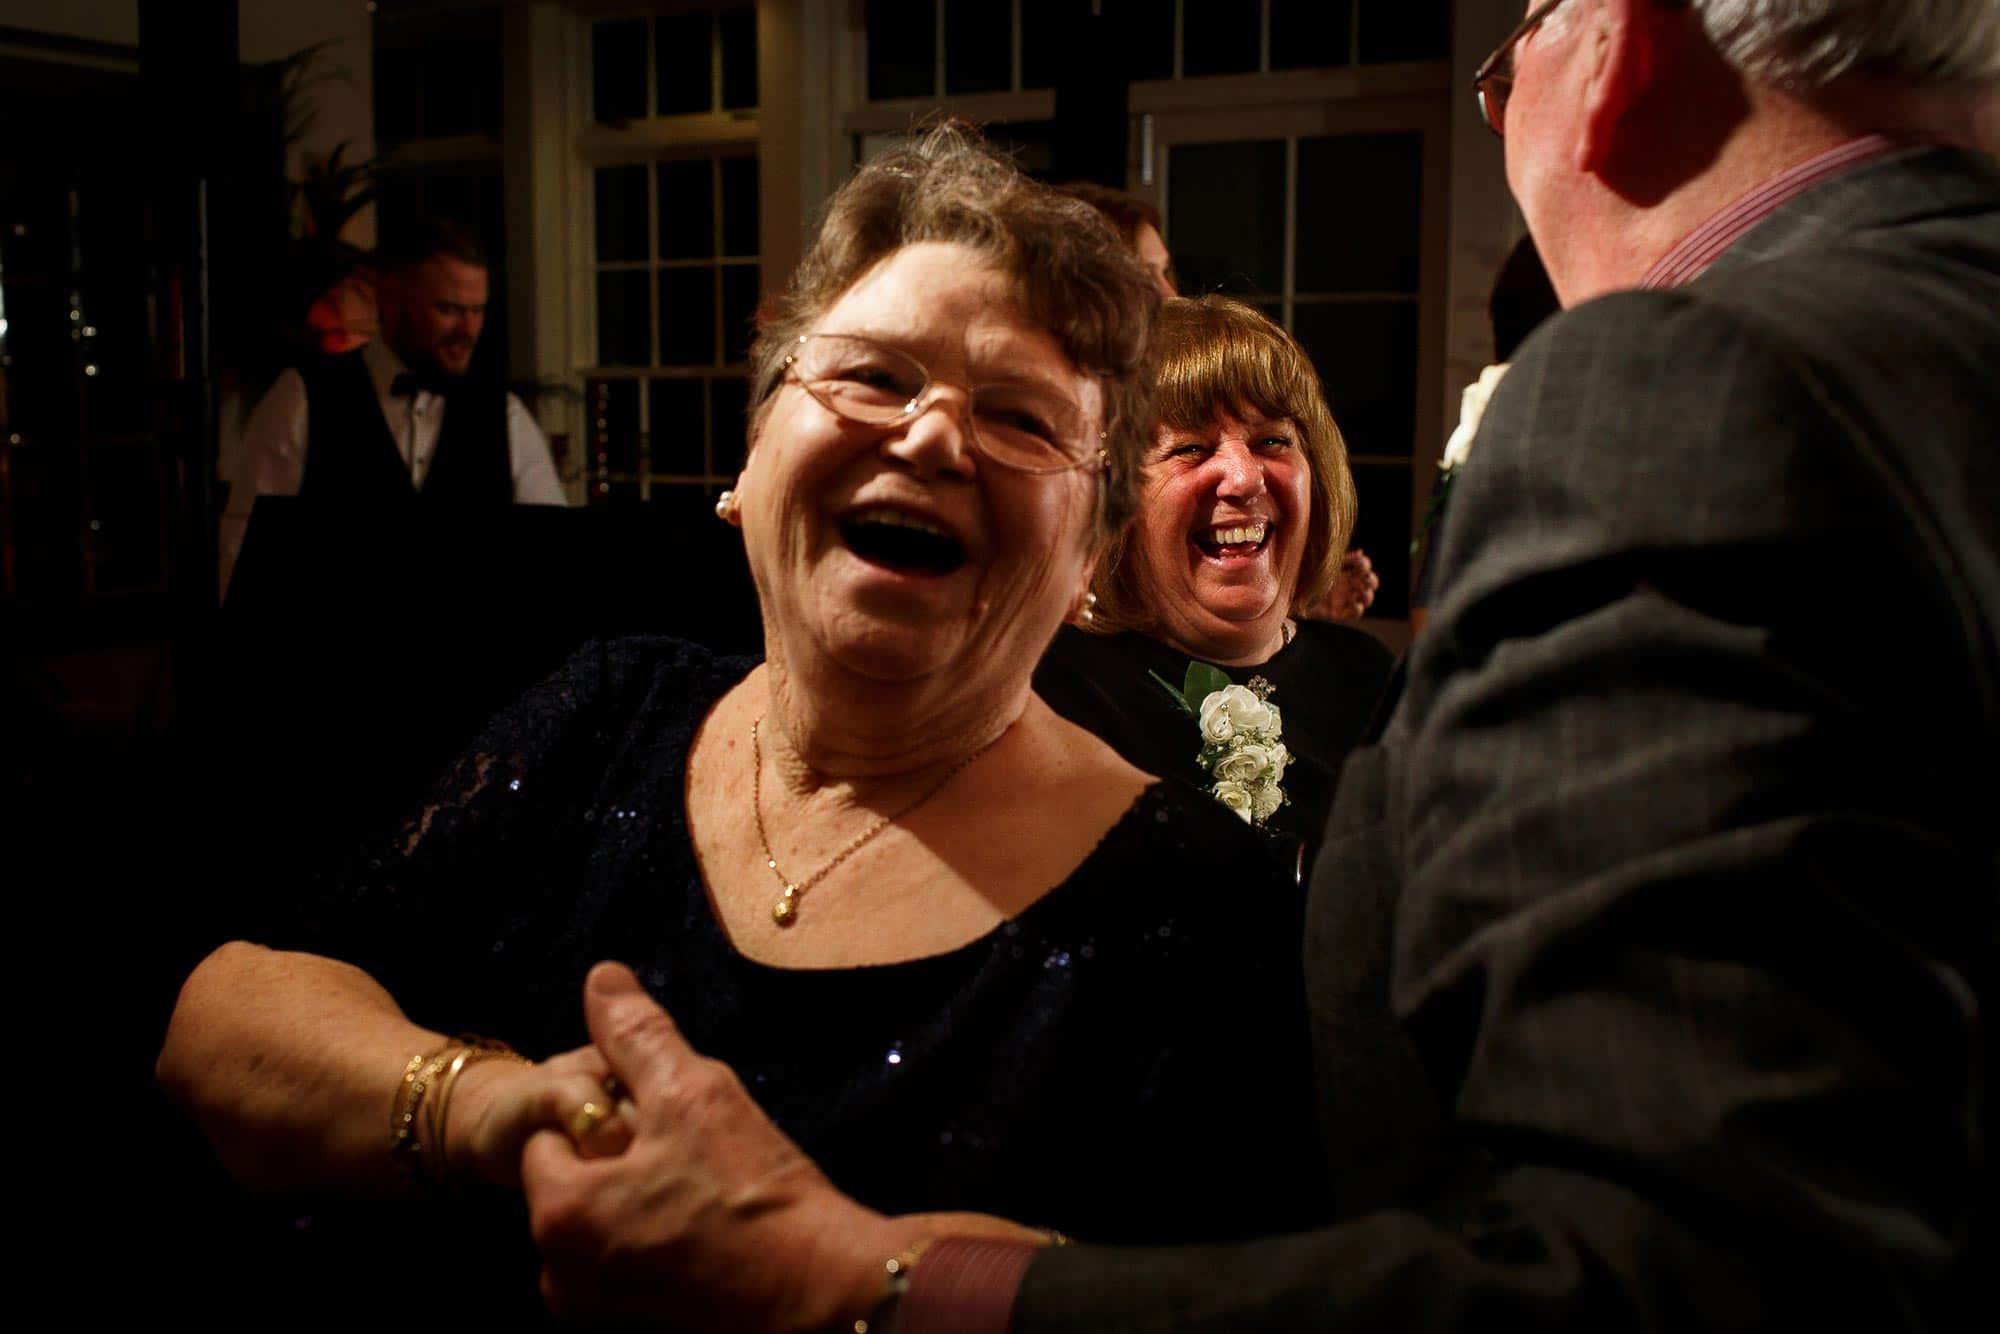 Wedding guests dancing at Mitton Hall wedding